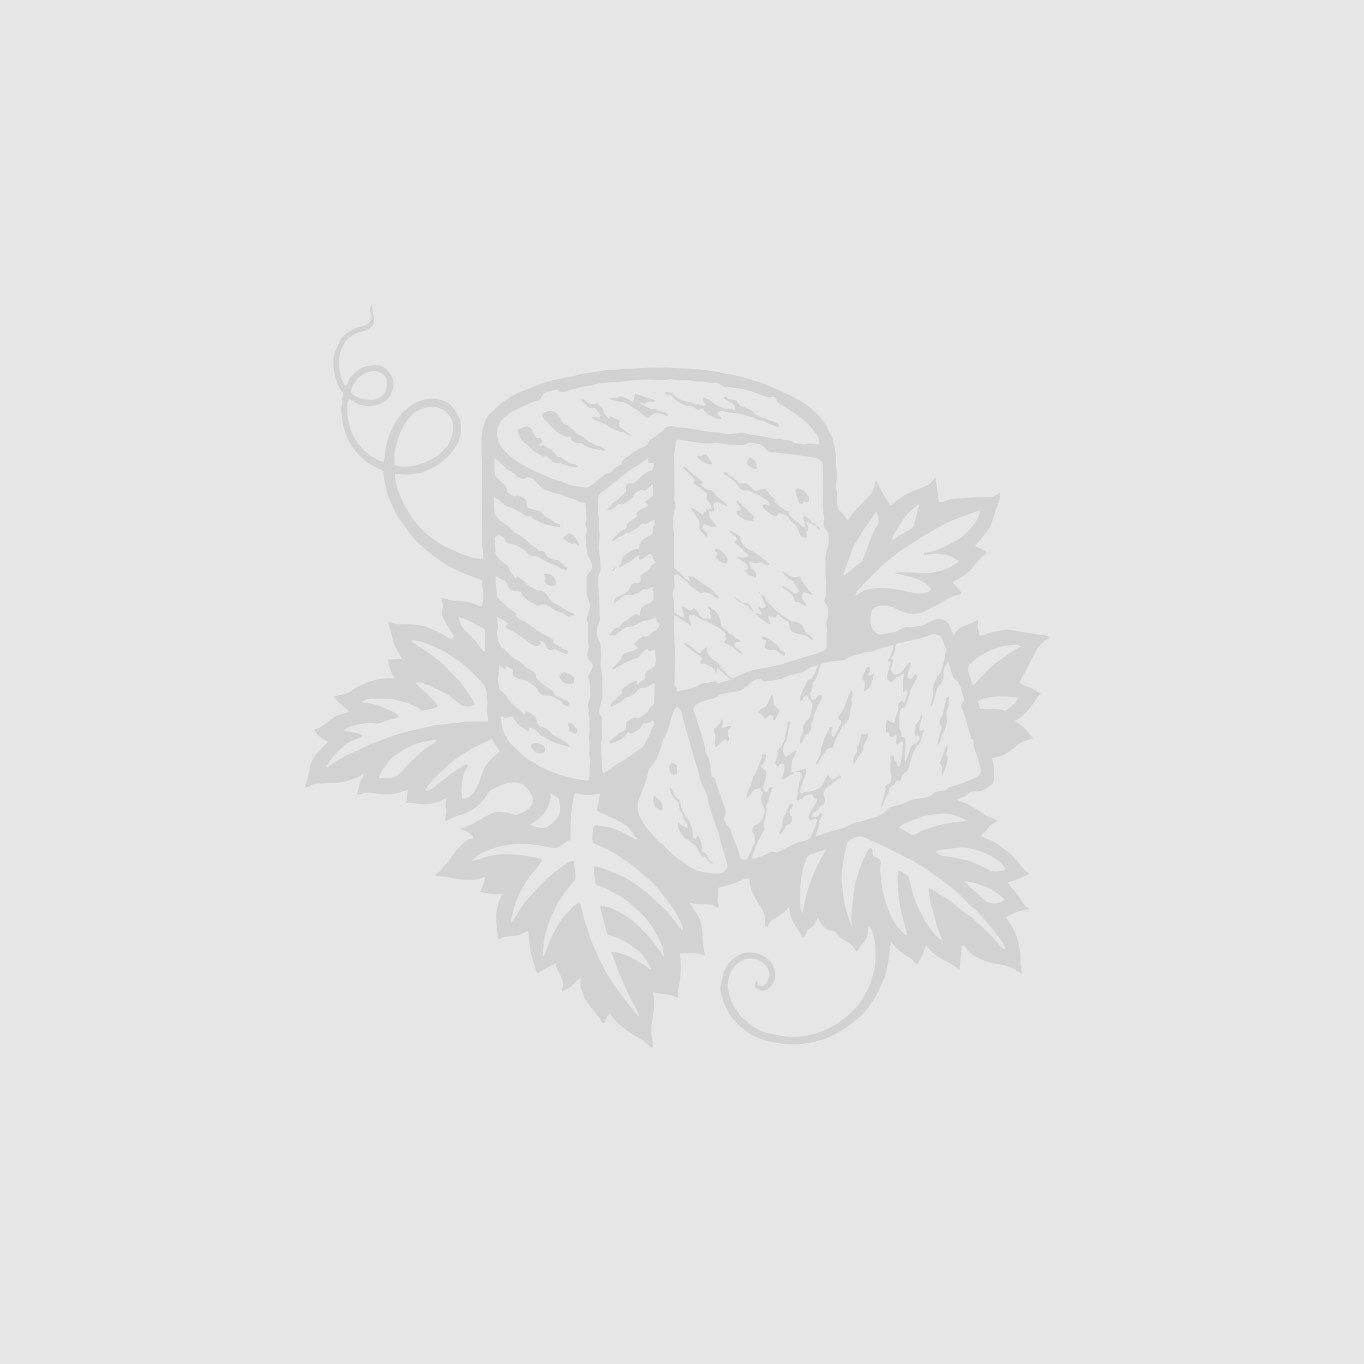 Six Nations - WALES BOX